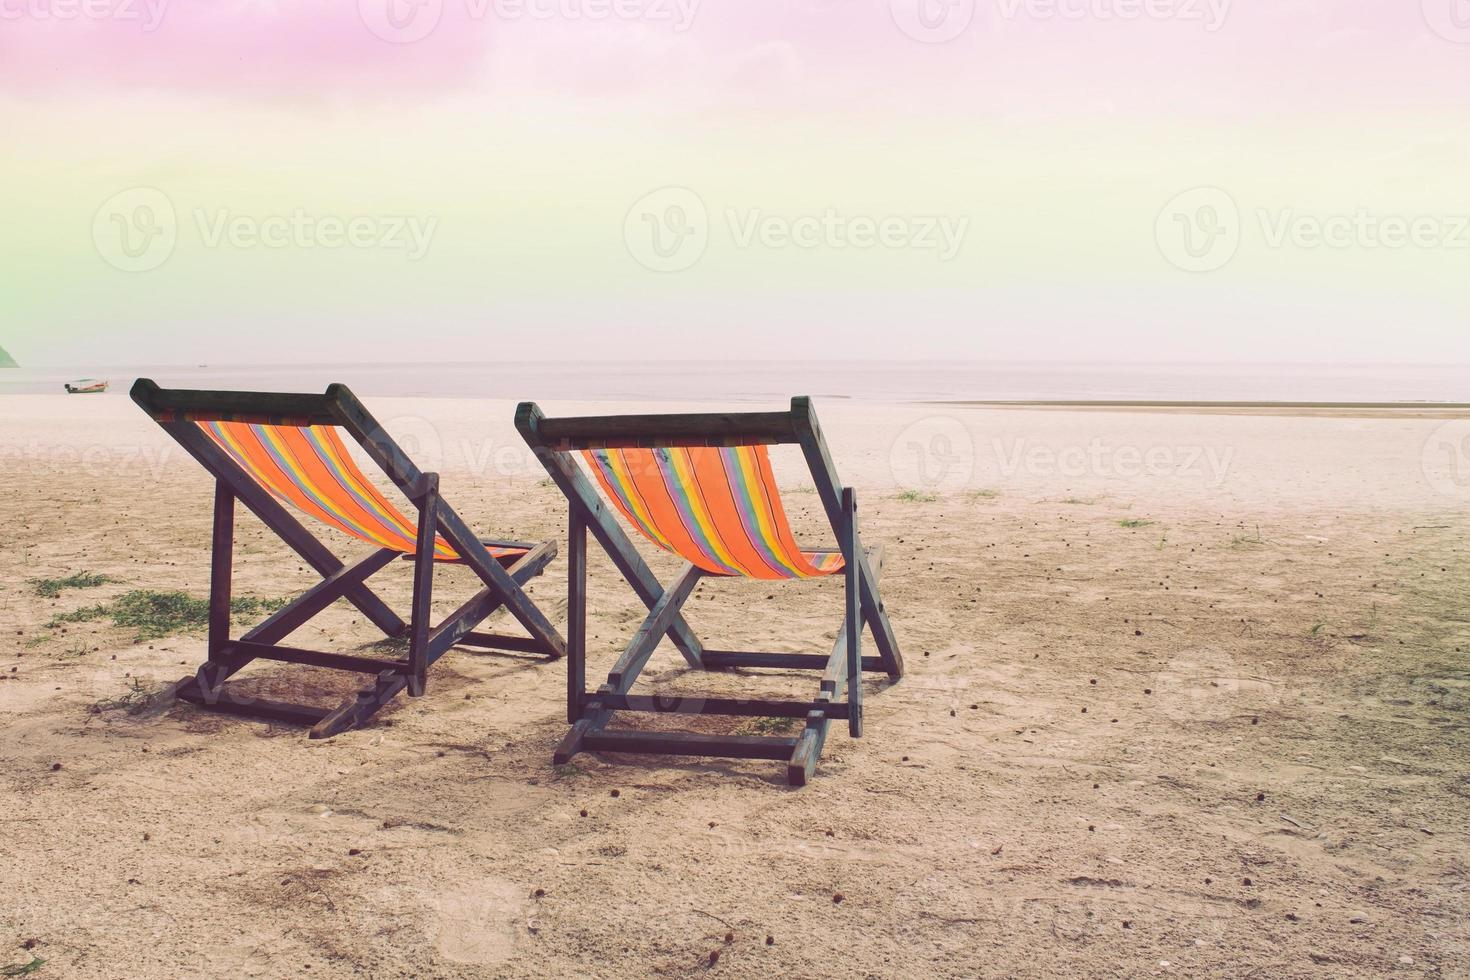 zwei Krippen am Strand, Meer und Himmel foto